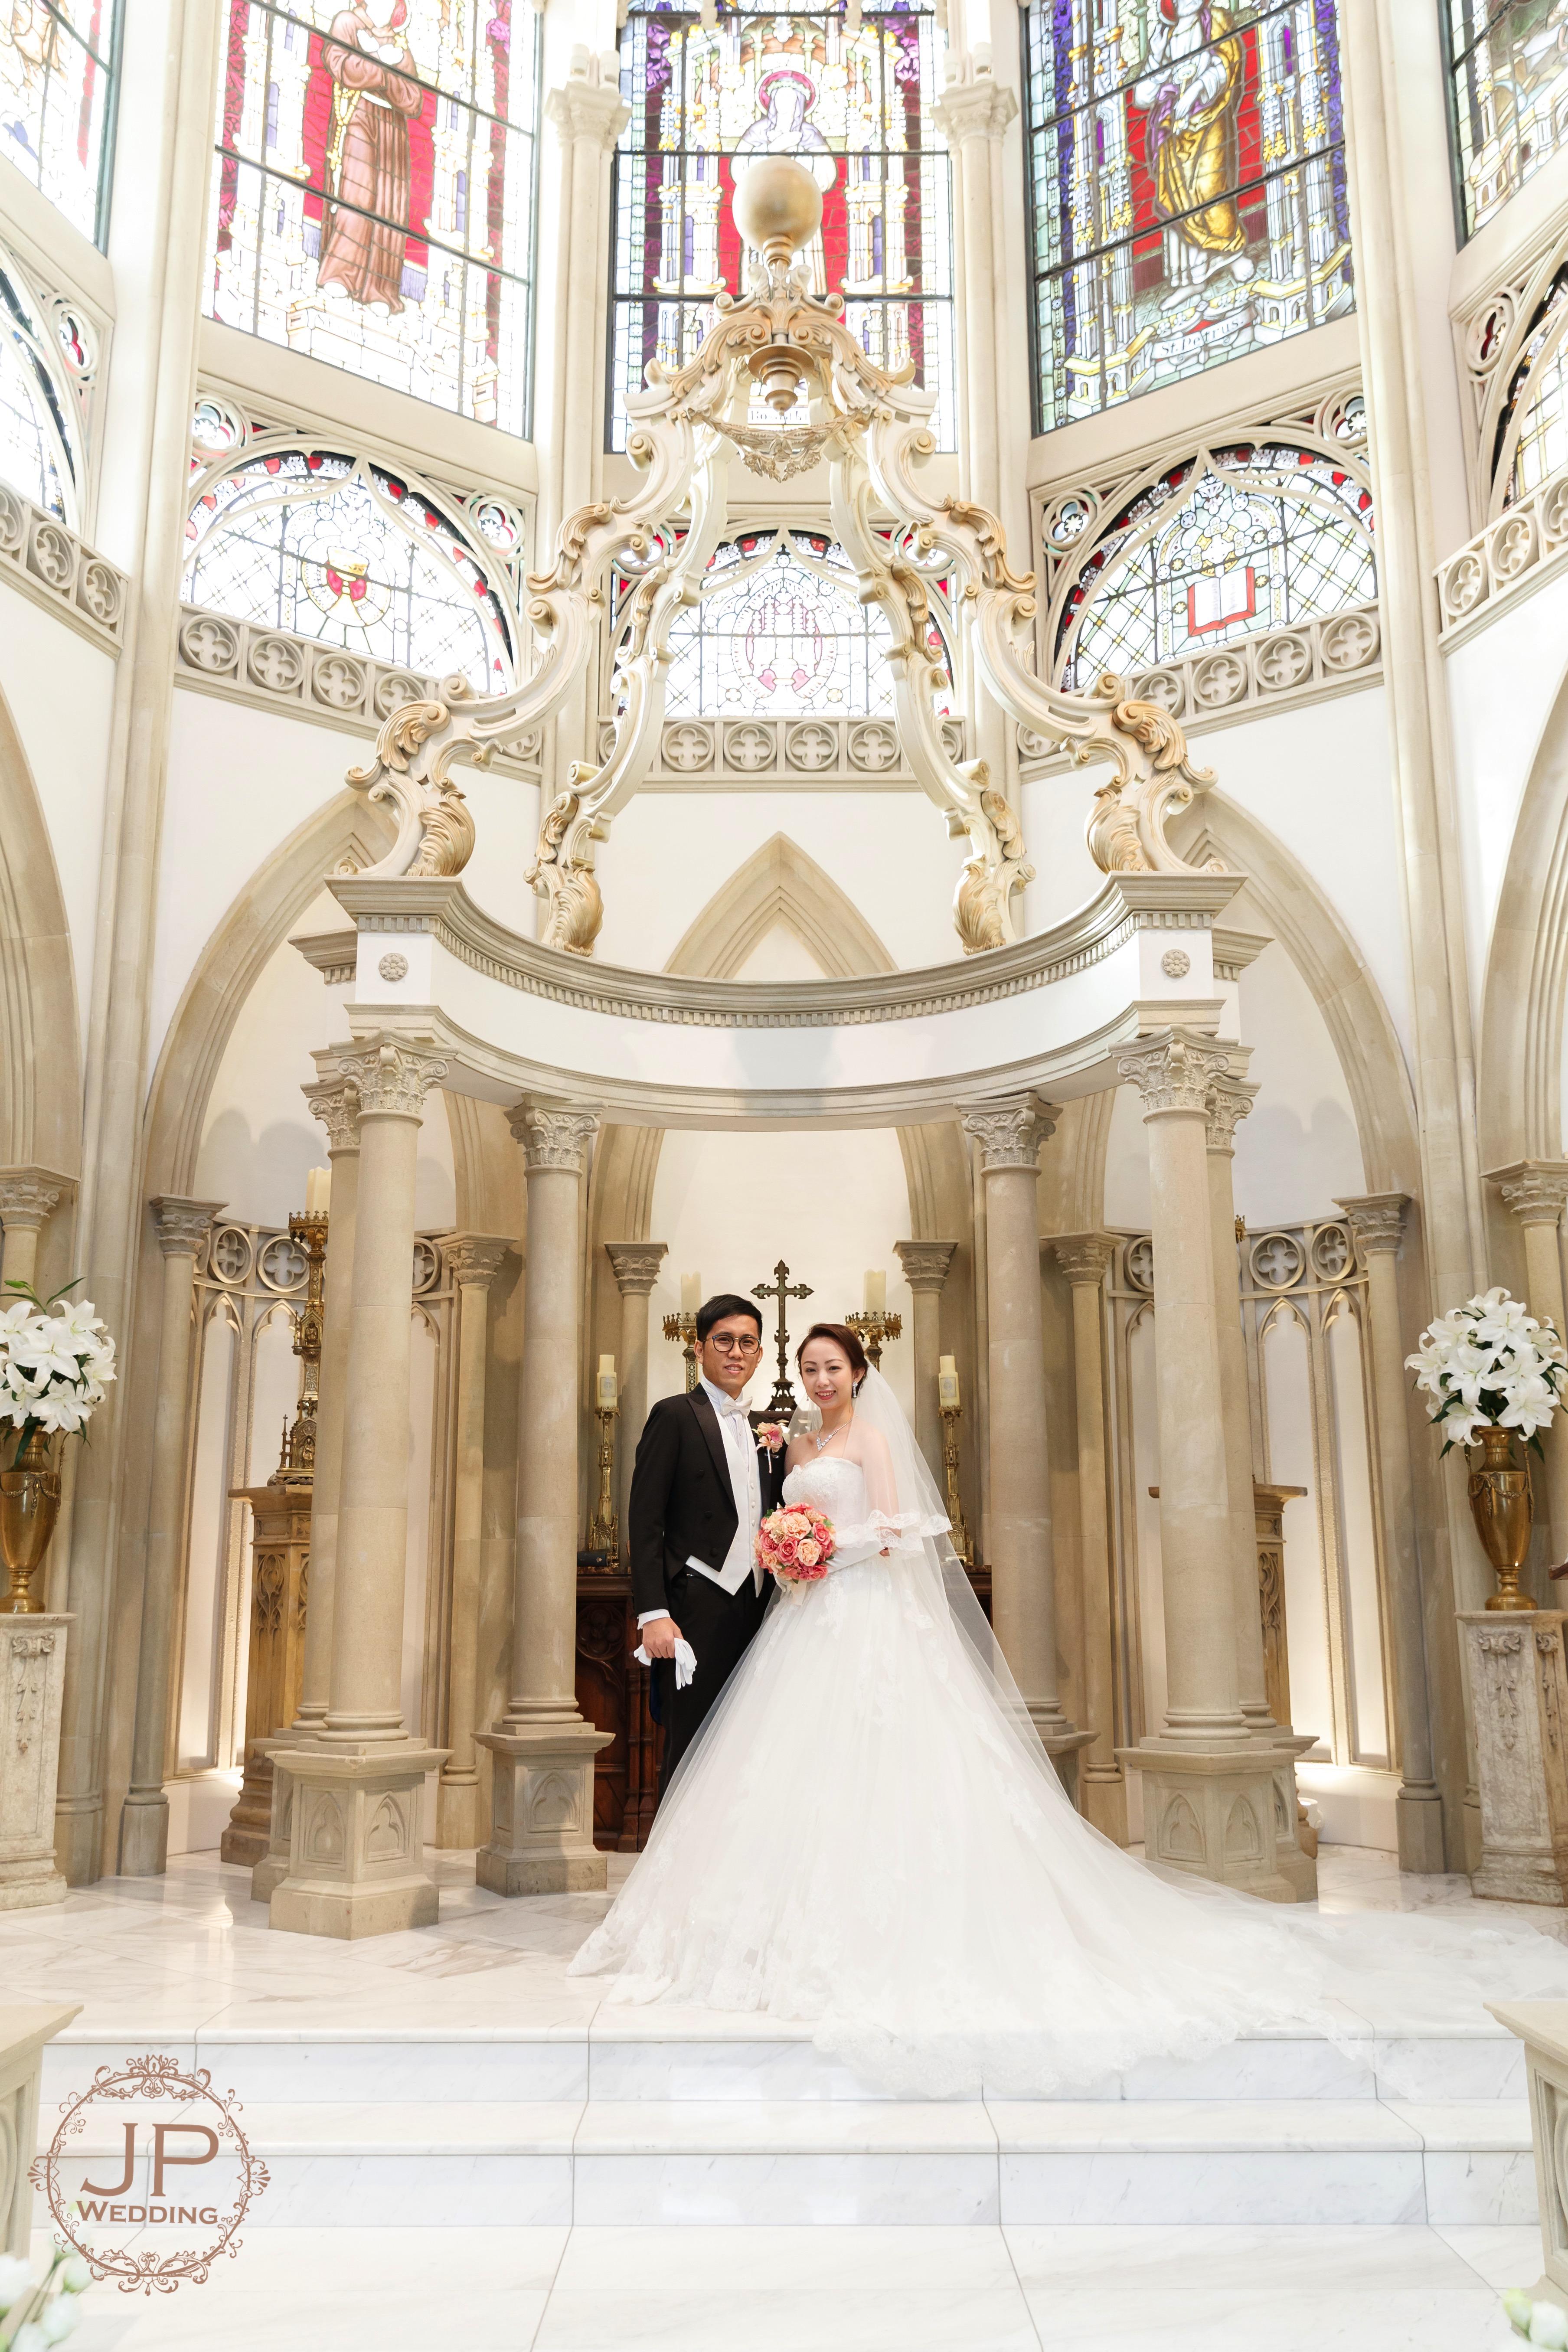 JP Wedding HK, Nagoya Glastonia 2018-24